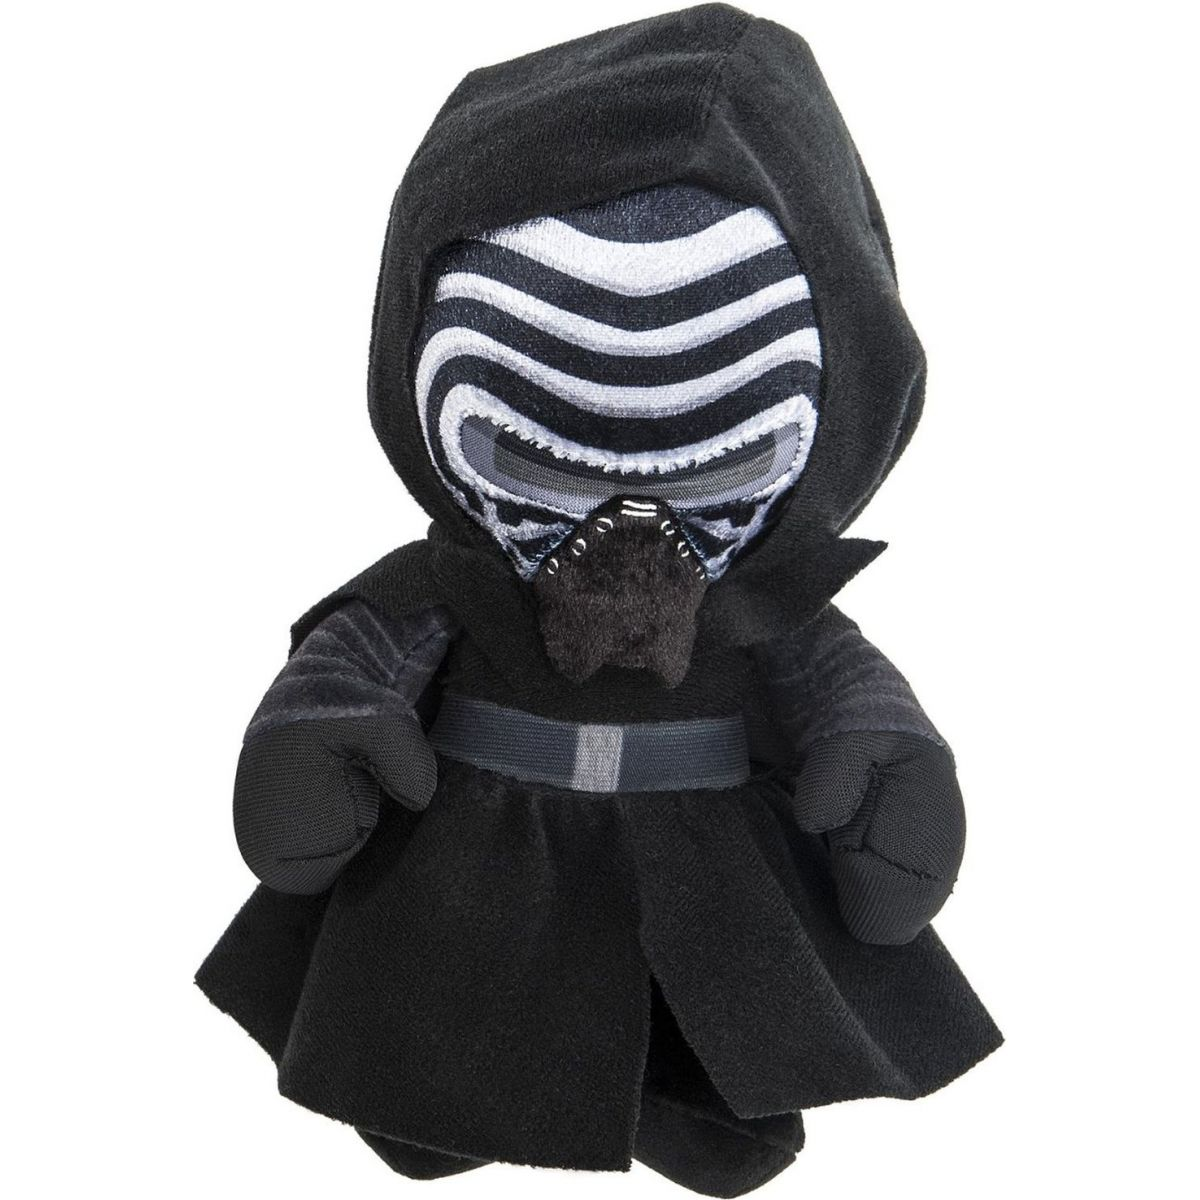 Star Wars VII Lead Villain 17 cm